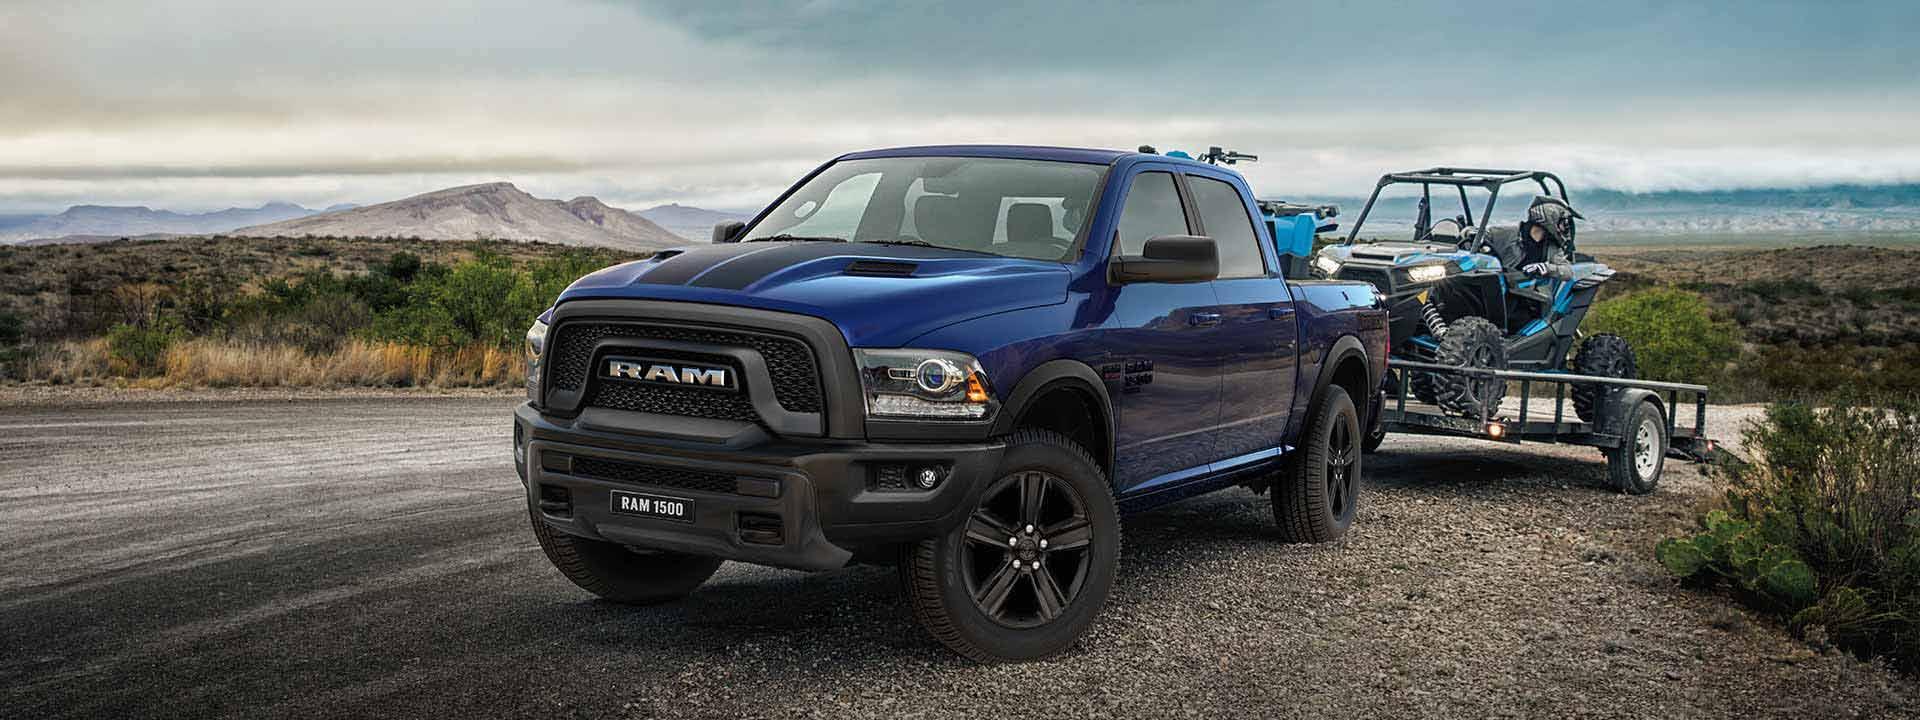 Finance your new Ram Truck at Tamworth Ram